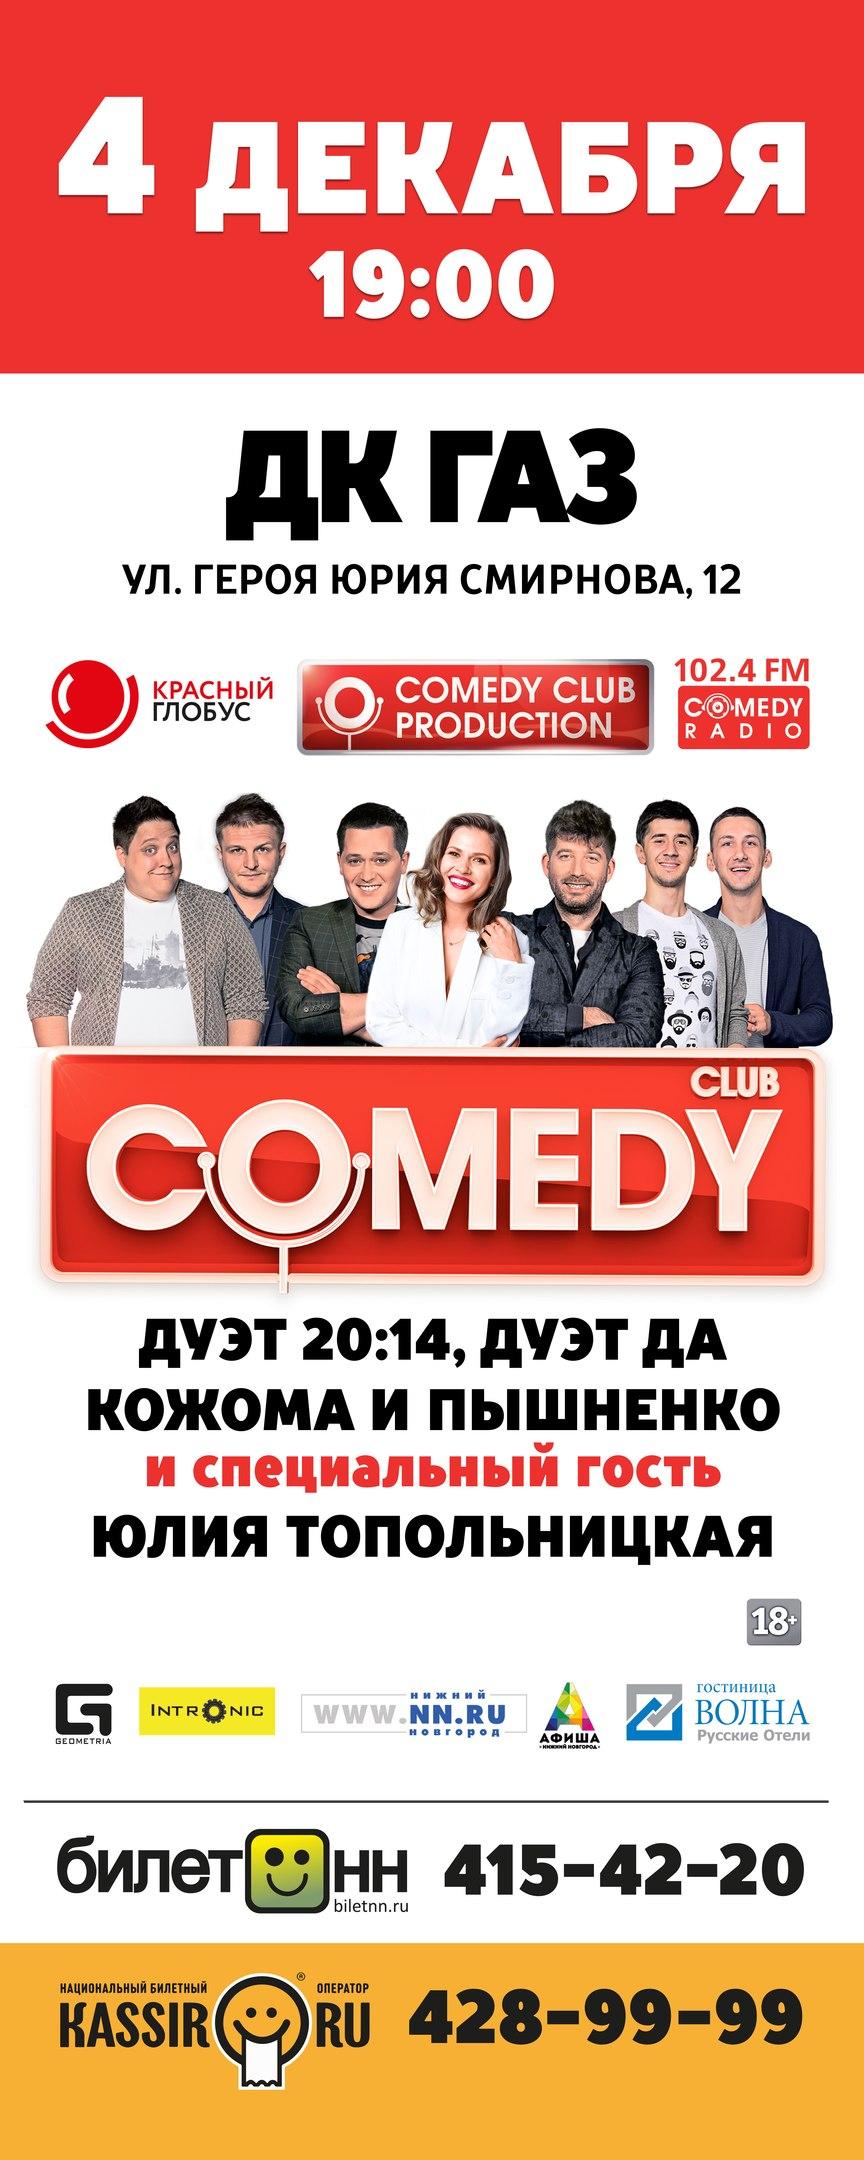 Comedy Club в НН